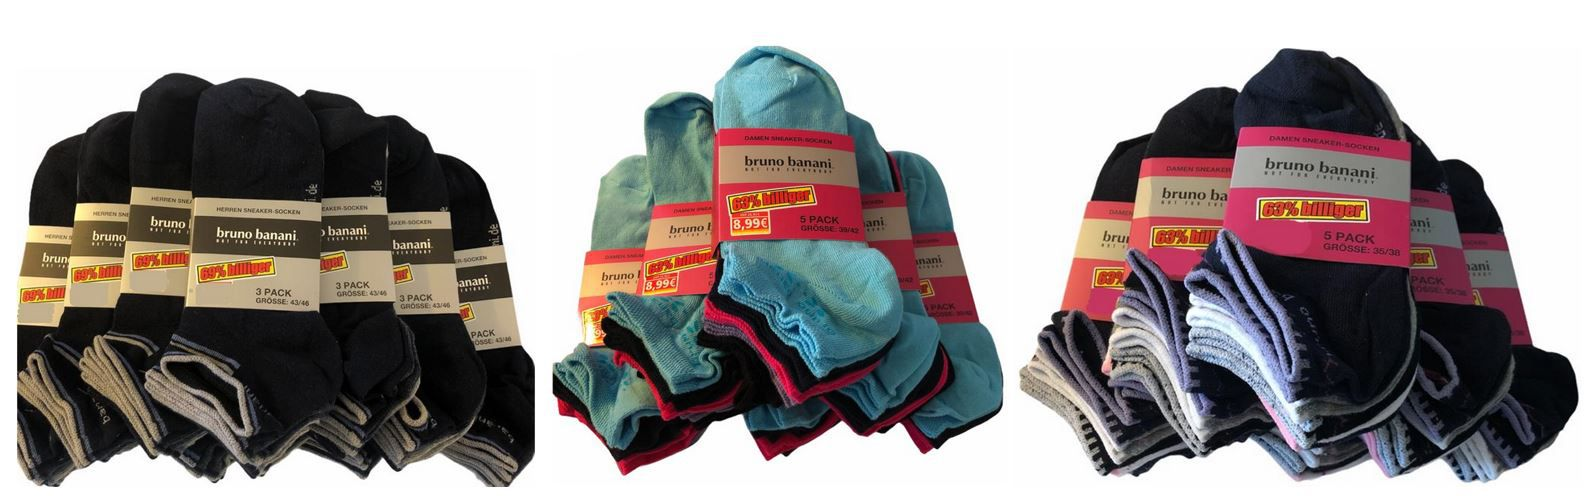 Bruno Banani Herren und Damen Sneaker Socken 30er Pack nur 39,99€ (statt 75€)